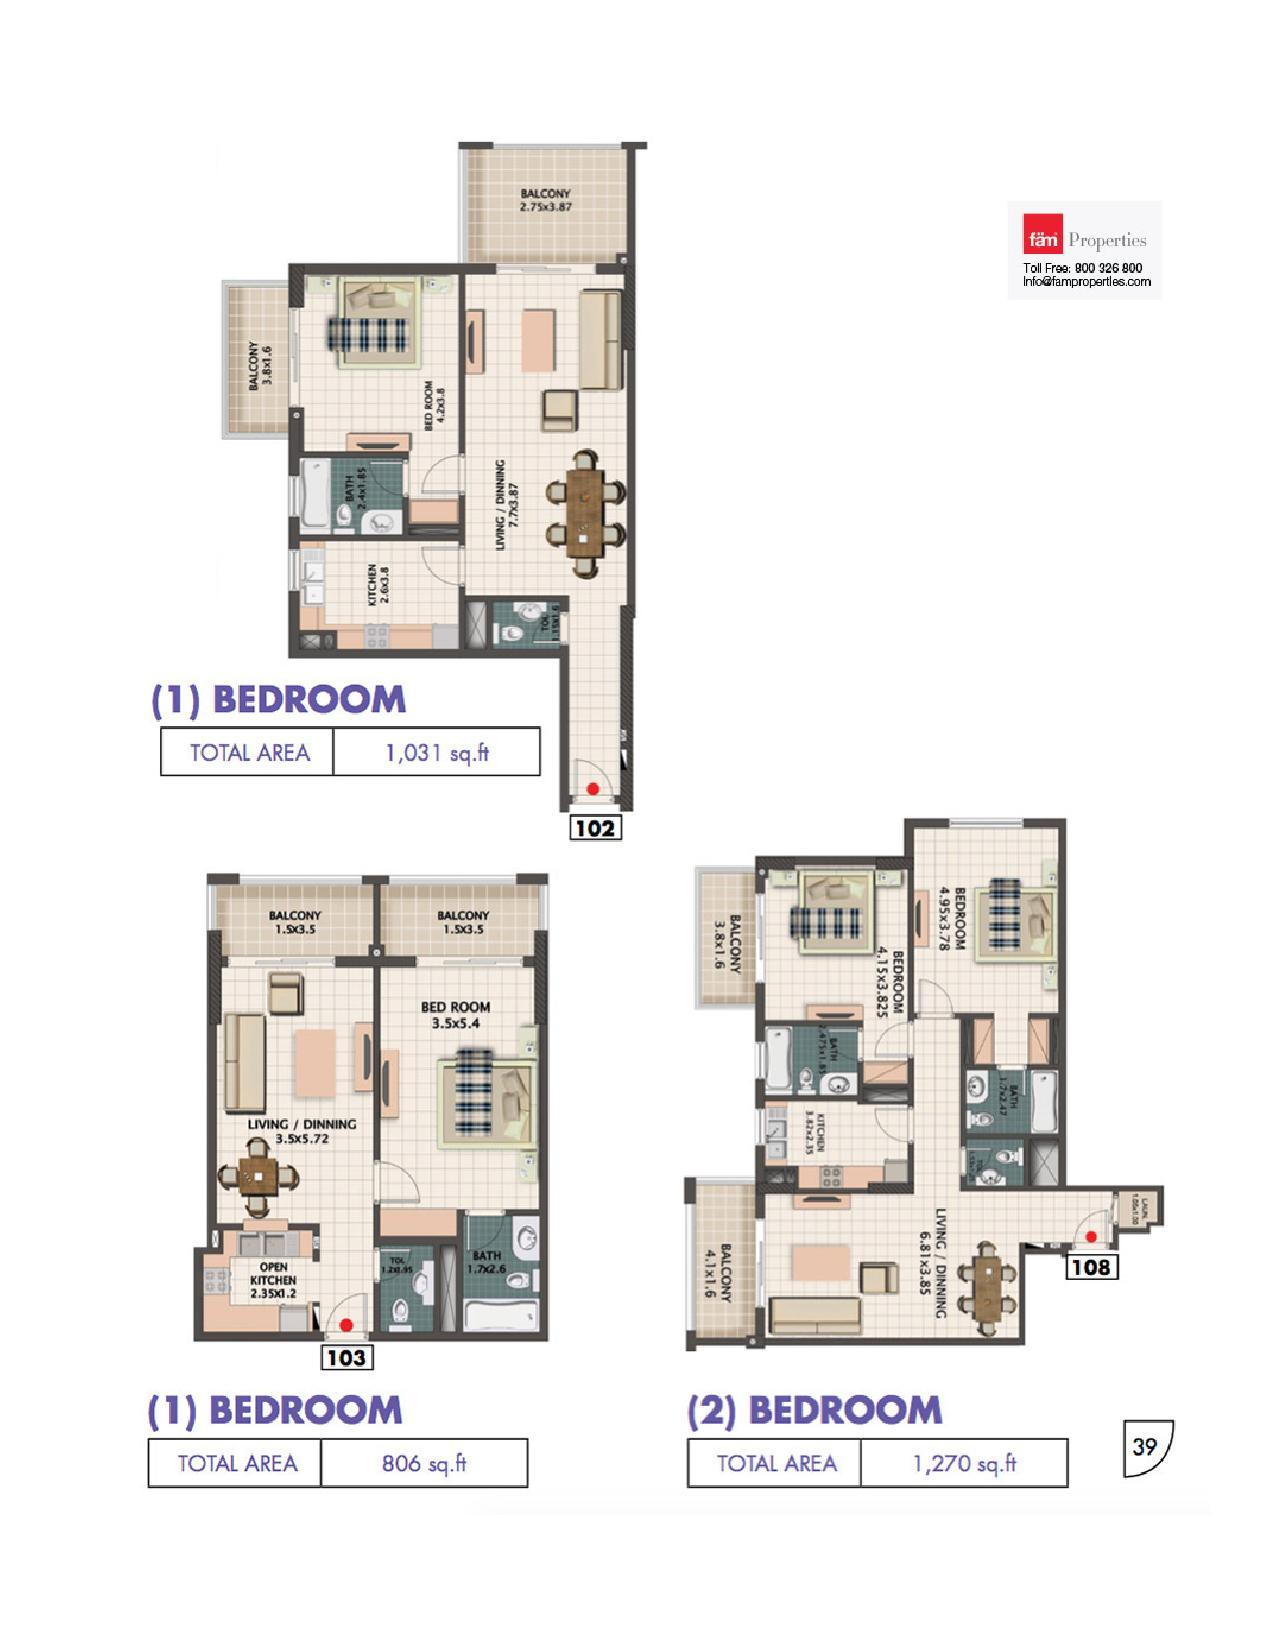 Floor Plans Queue Point Apartments Liwan Dubailand #0: queue point 837